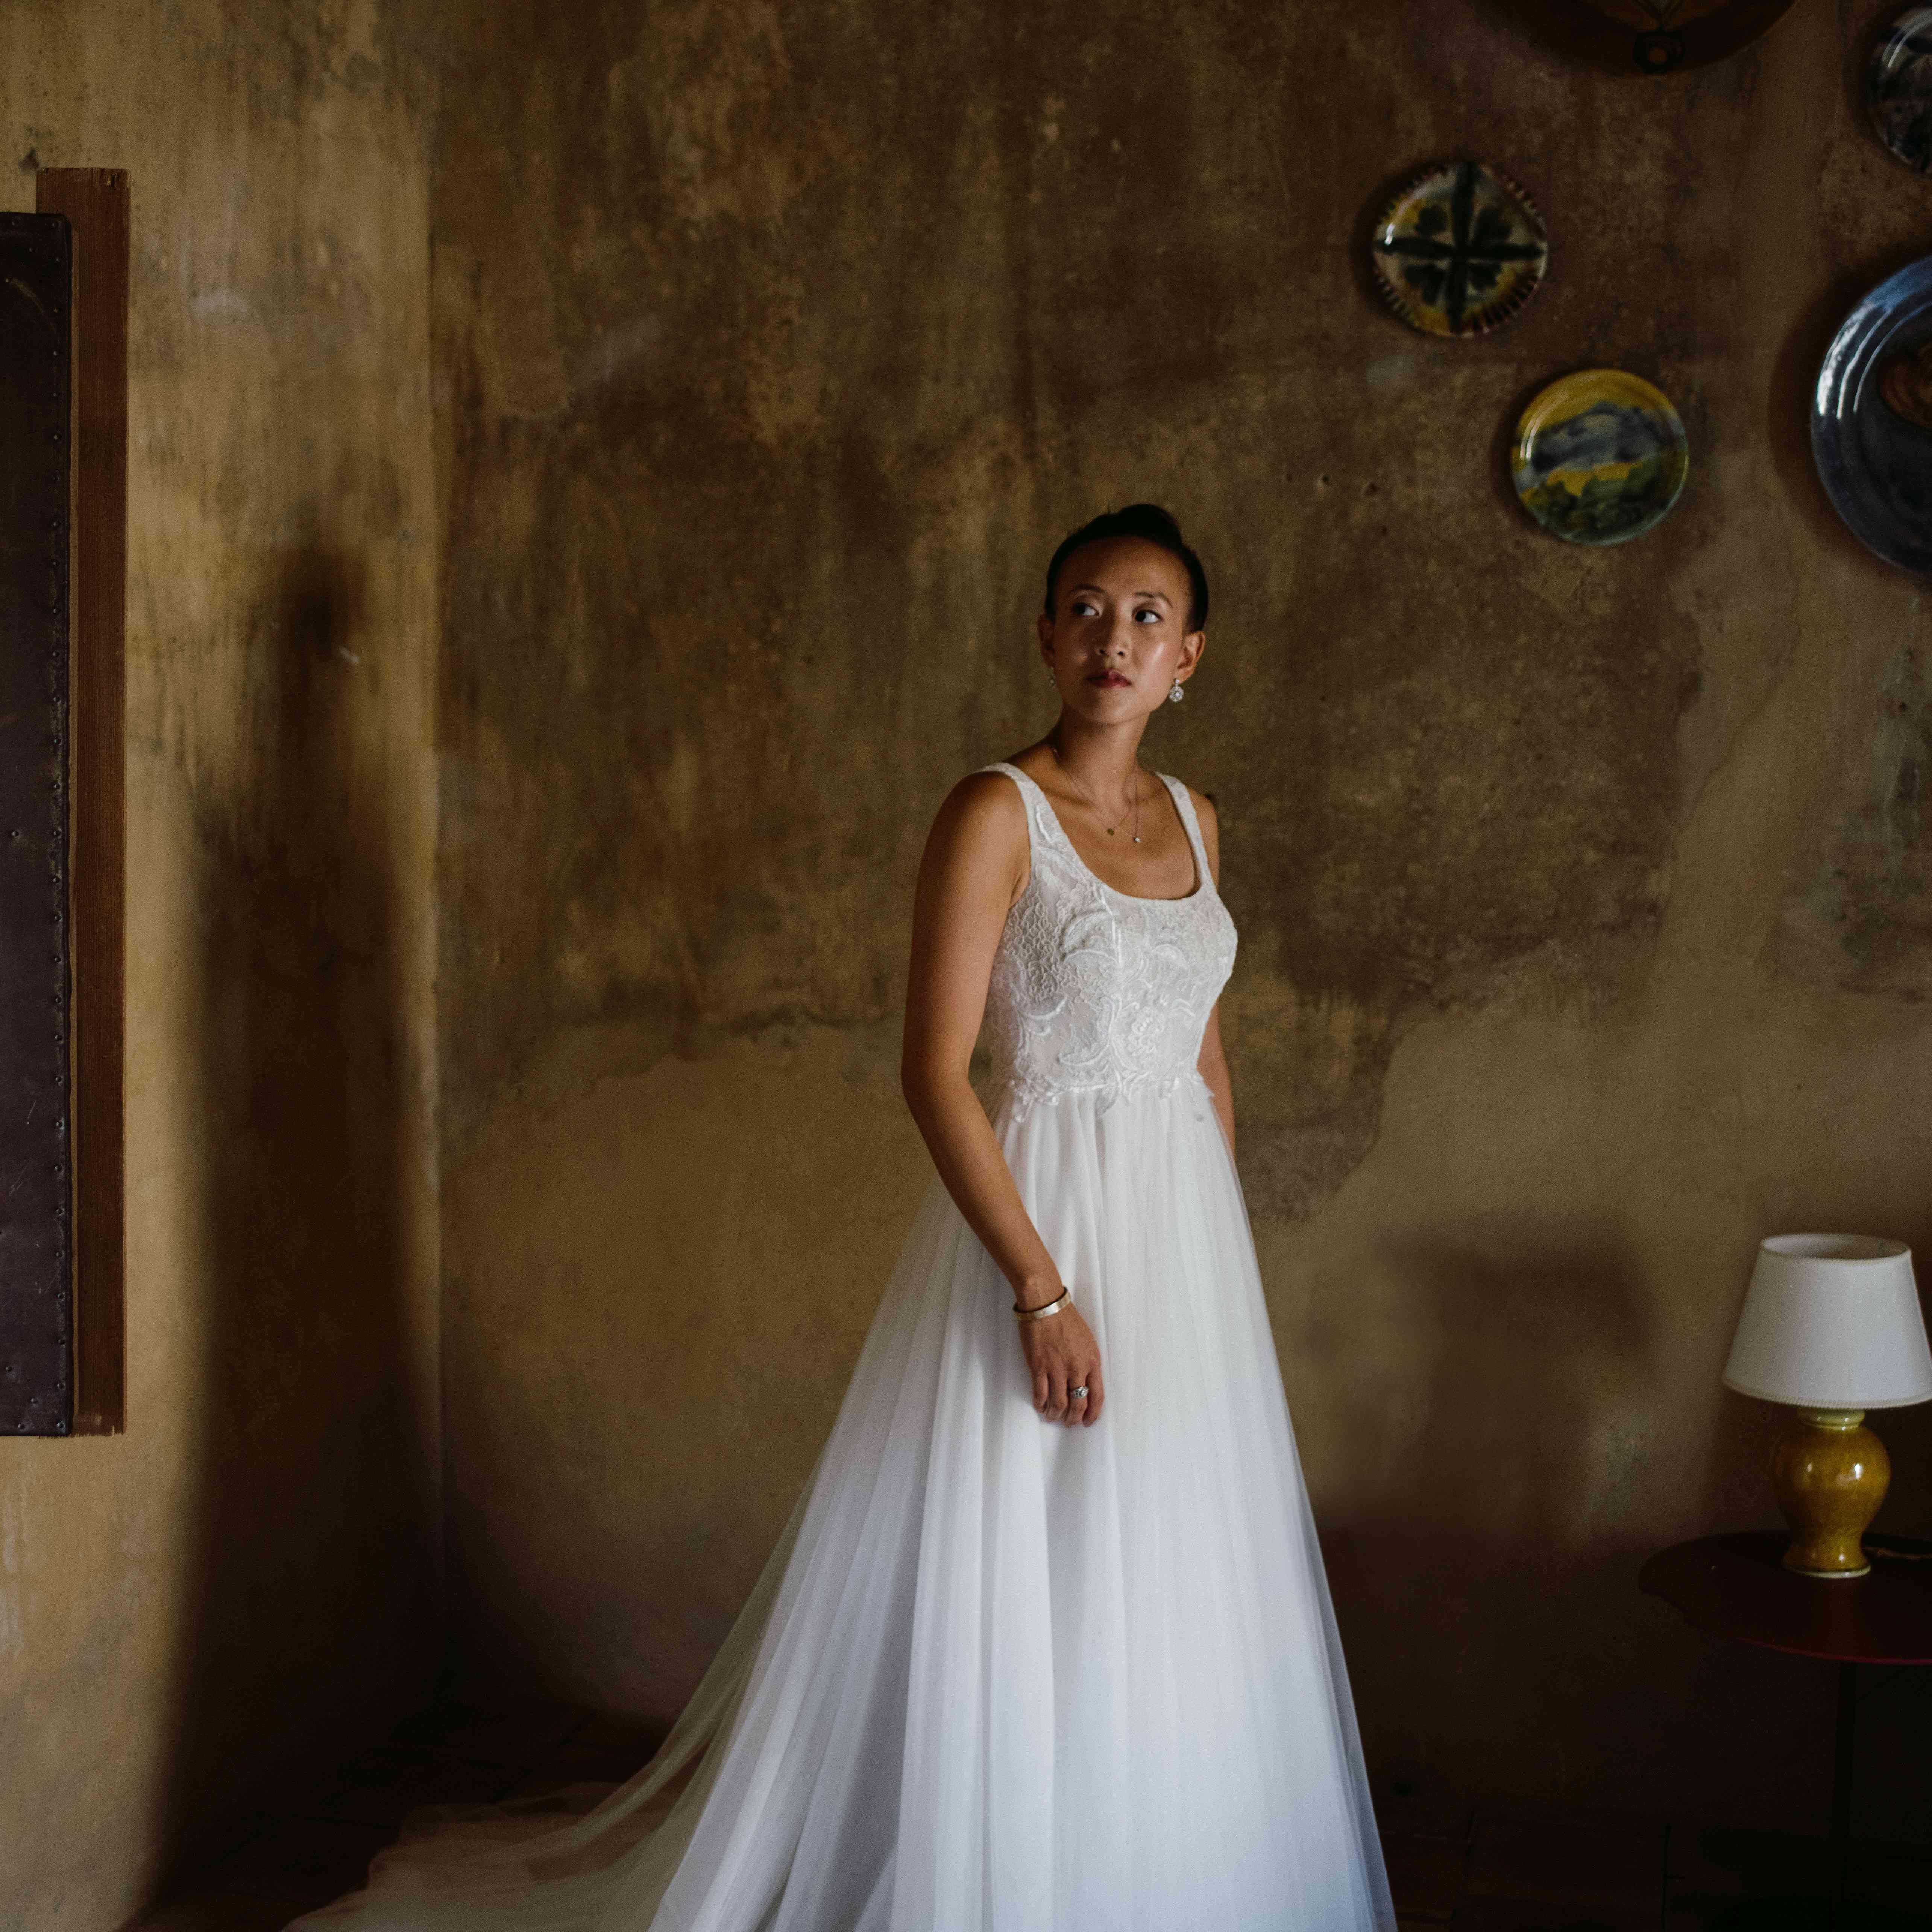 Bride standing in a room in her wedding gown